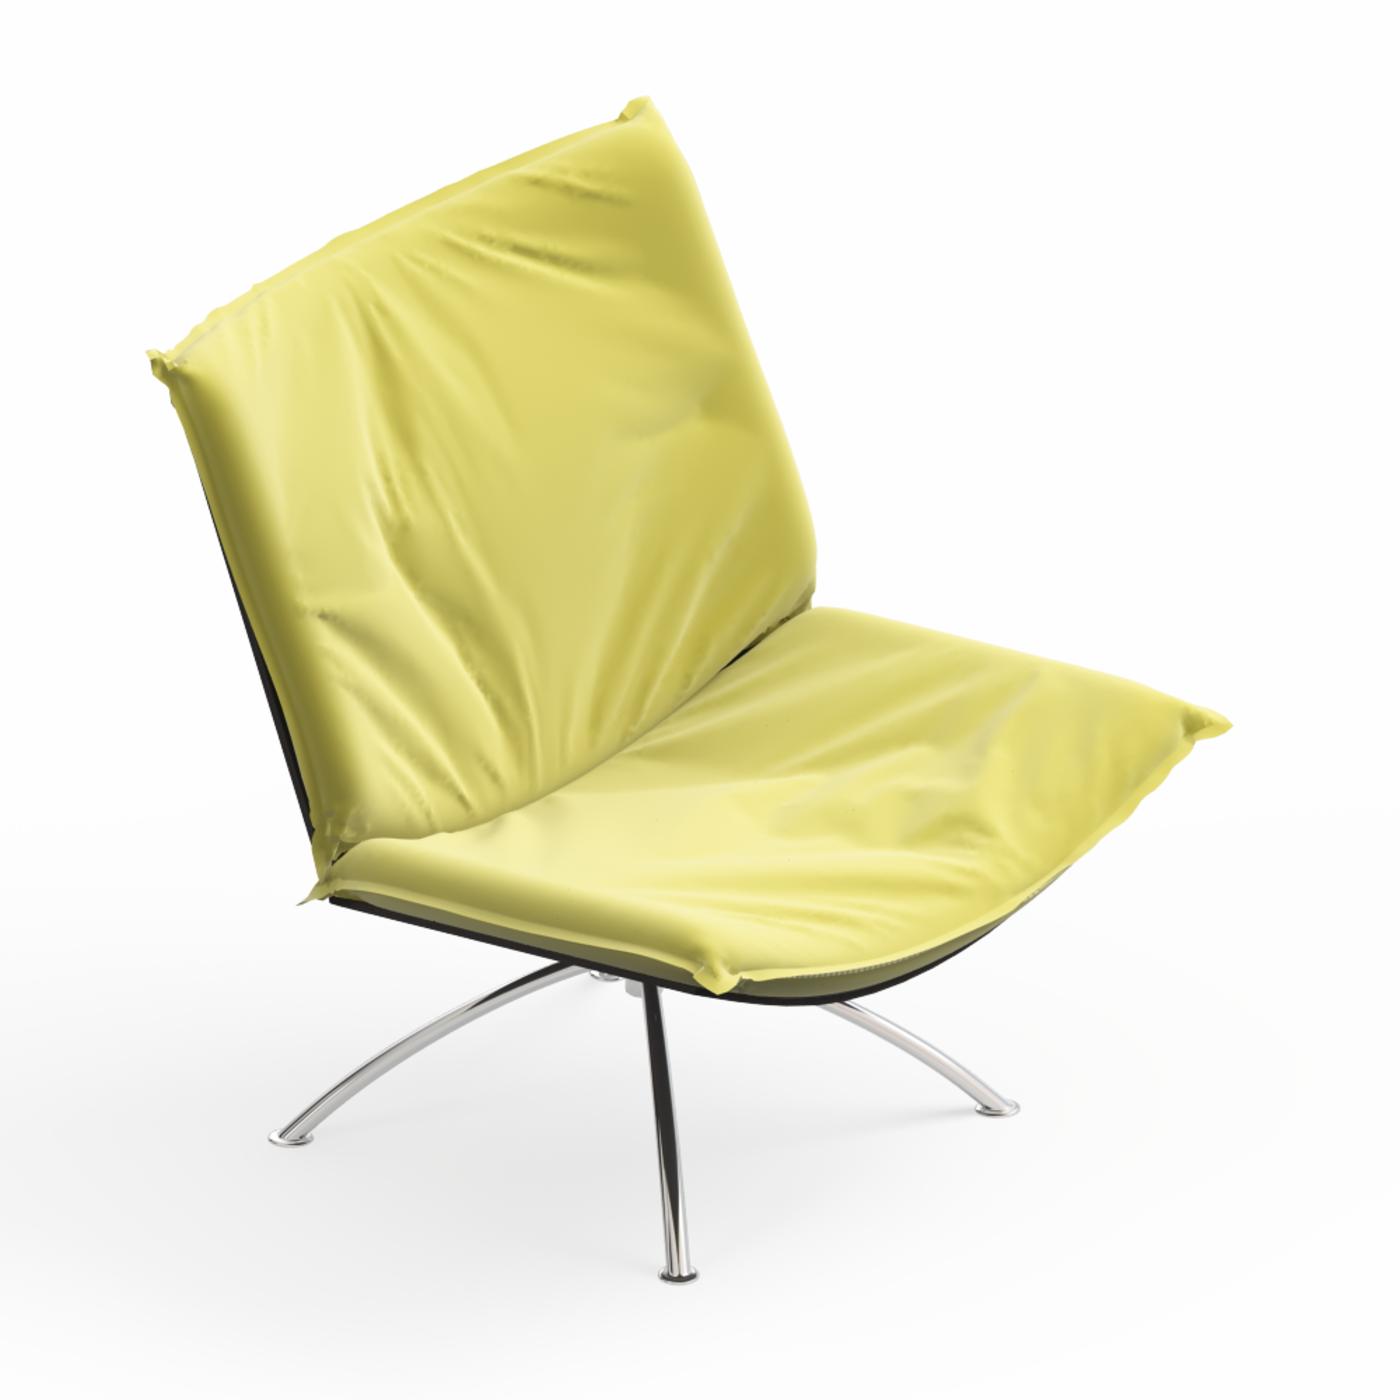 Armchair Modern Collection 6x